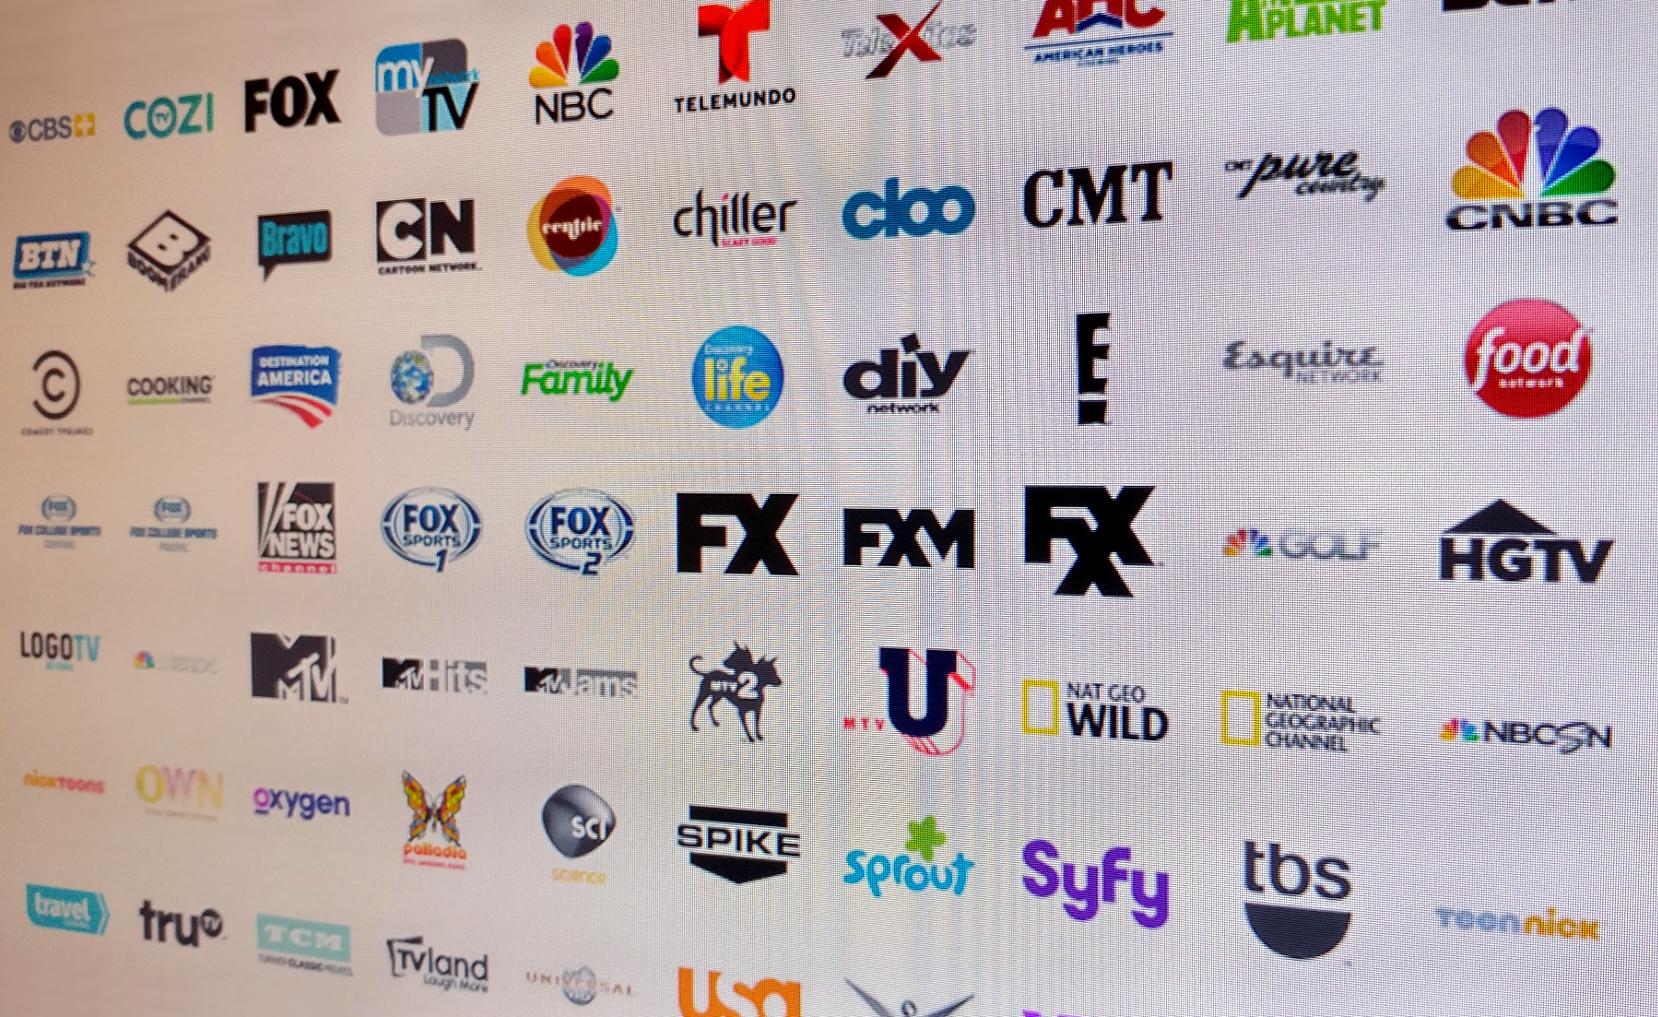 Youtube Tv Vs Playstation Vue Vs Sling Tv Vs Directv Now